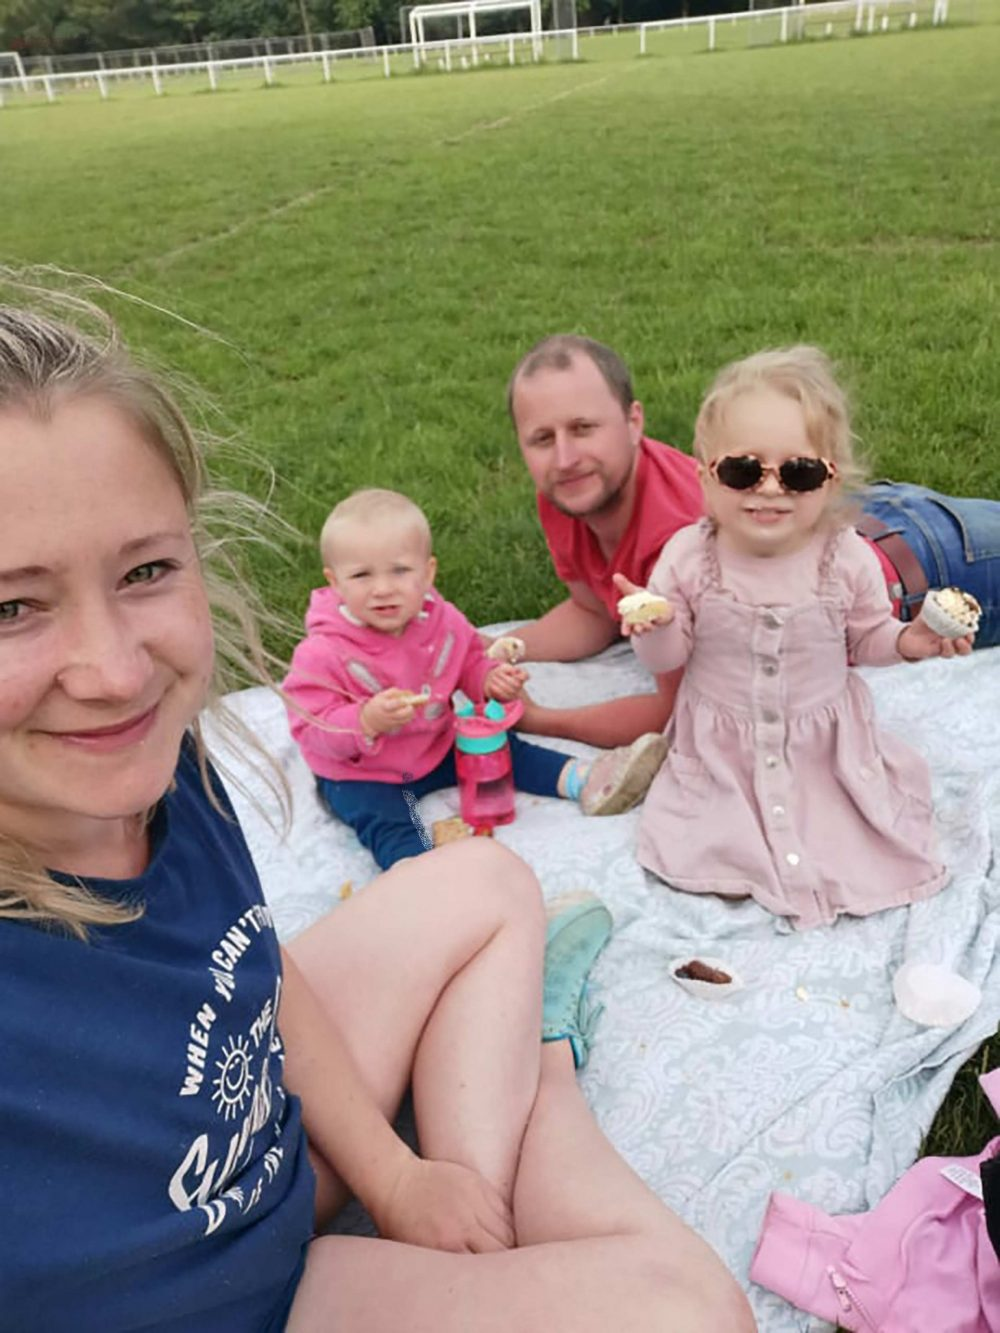 The beautiful family - Sports News UK